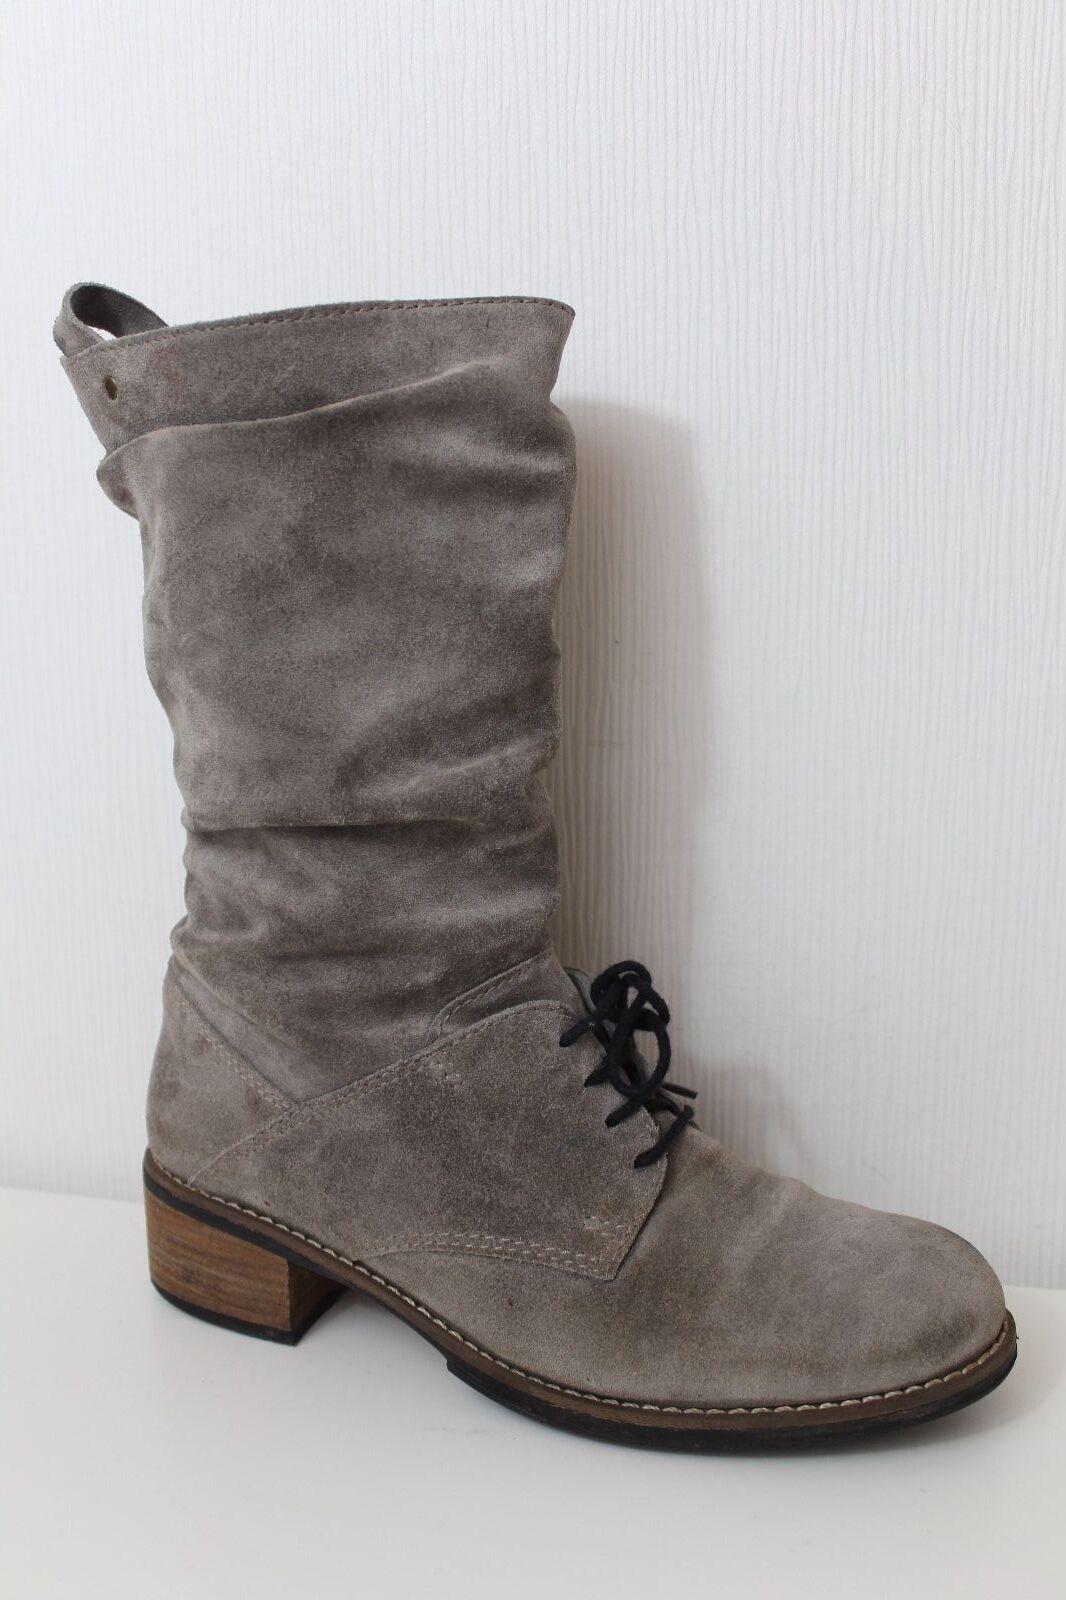 Wolky señora botas Lace Lace botas up Boots 41 ata zapatos de gamuza Lagenlook ed28b8